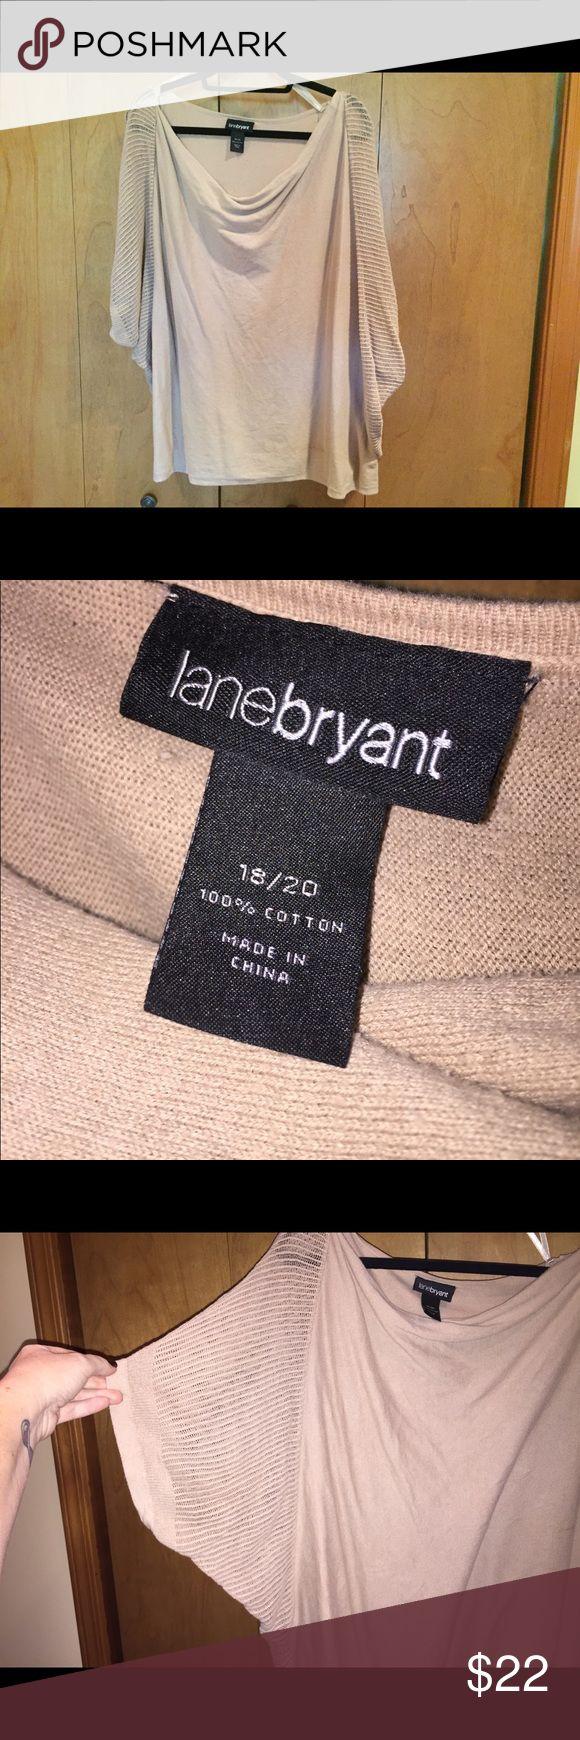 "18/20 Lane Bryant Cream batwing top Very cute cream colored batwing top.  23"" at bust and 28"" long Lane Bryant Tops Tunics"